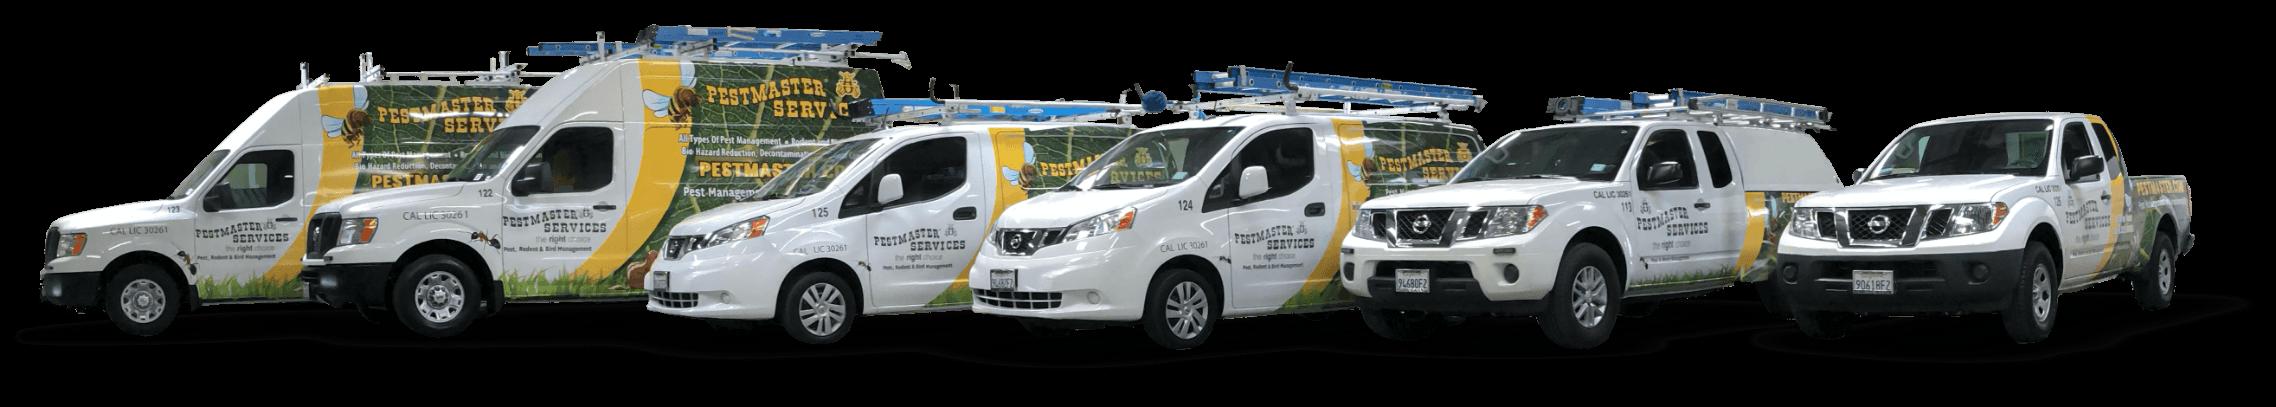 pestmaster services trucks